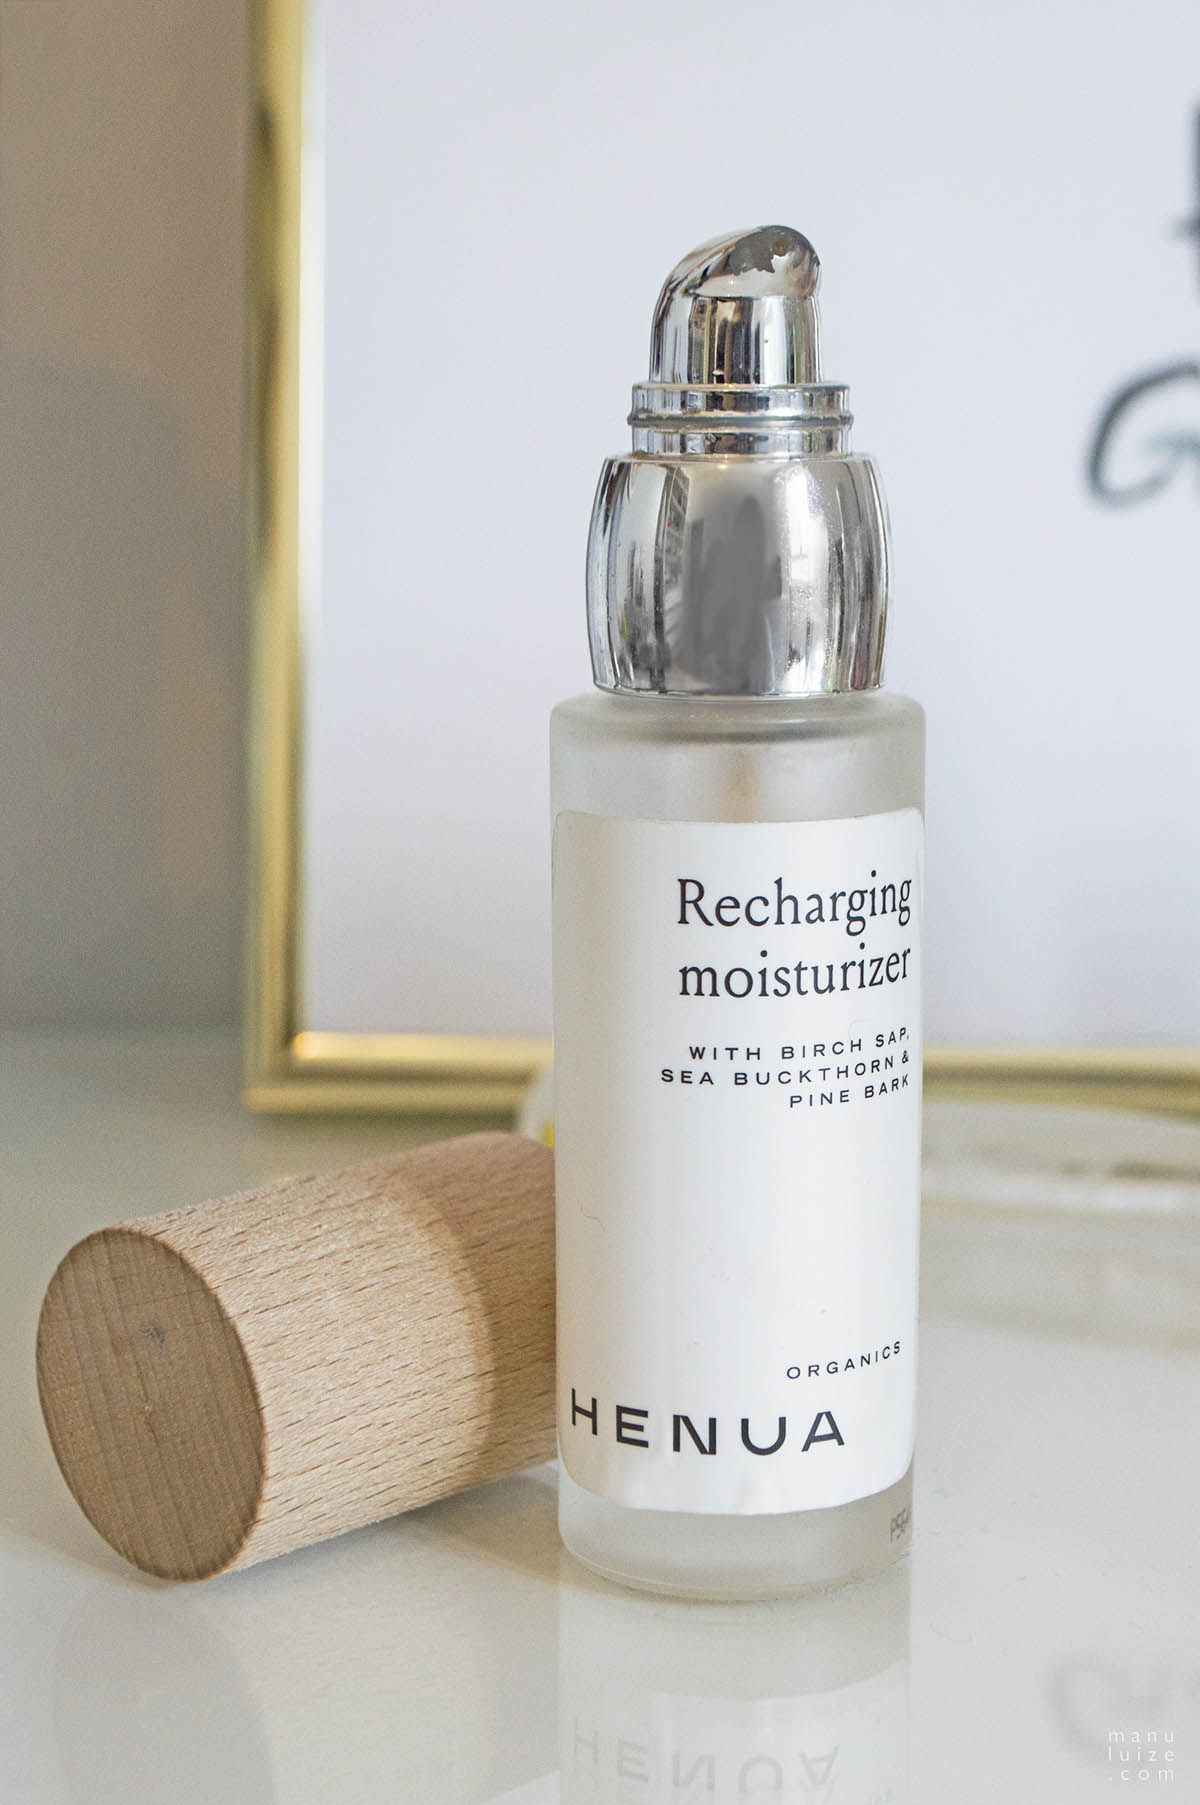 Recharging Moisturizer - Henua Organics Skincare